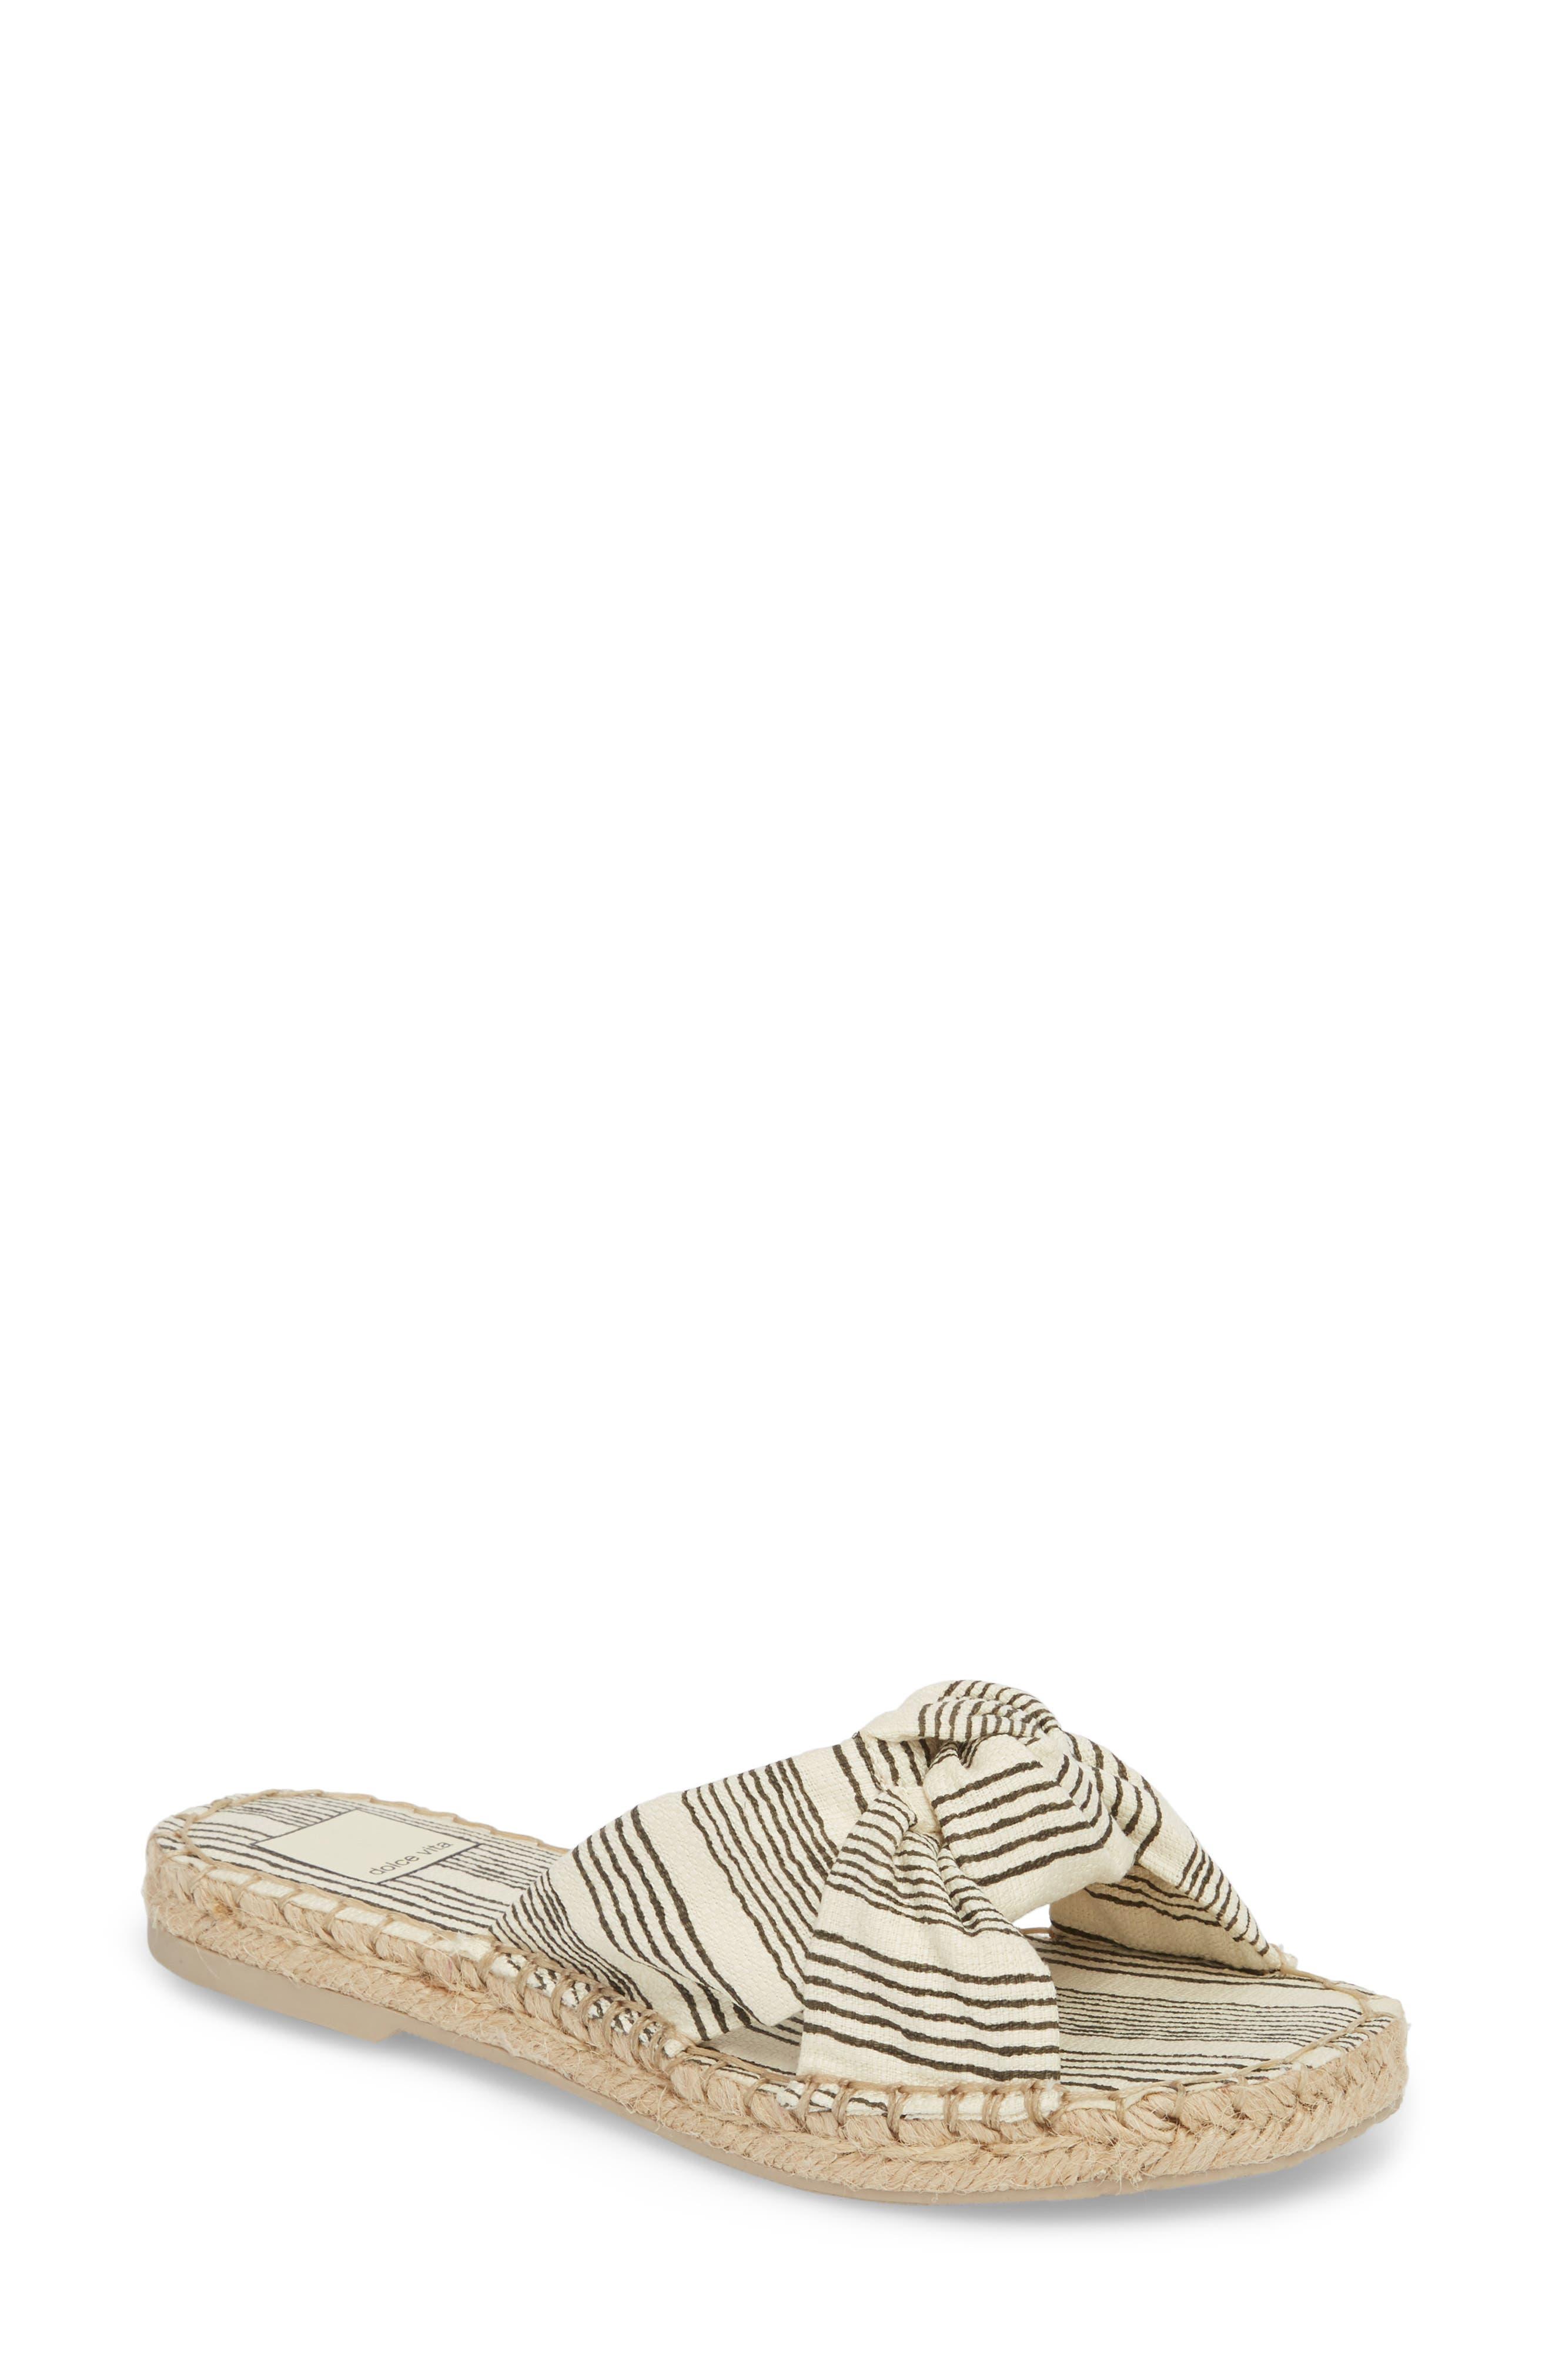 Main Image - Dolce Vita Benicia Knotted Slide Sandal (Women)